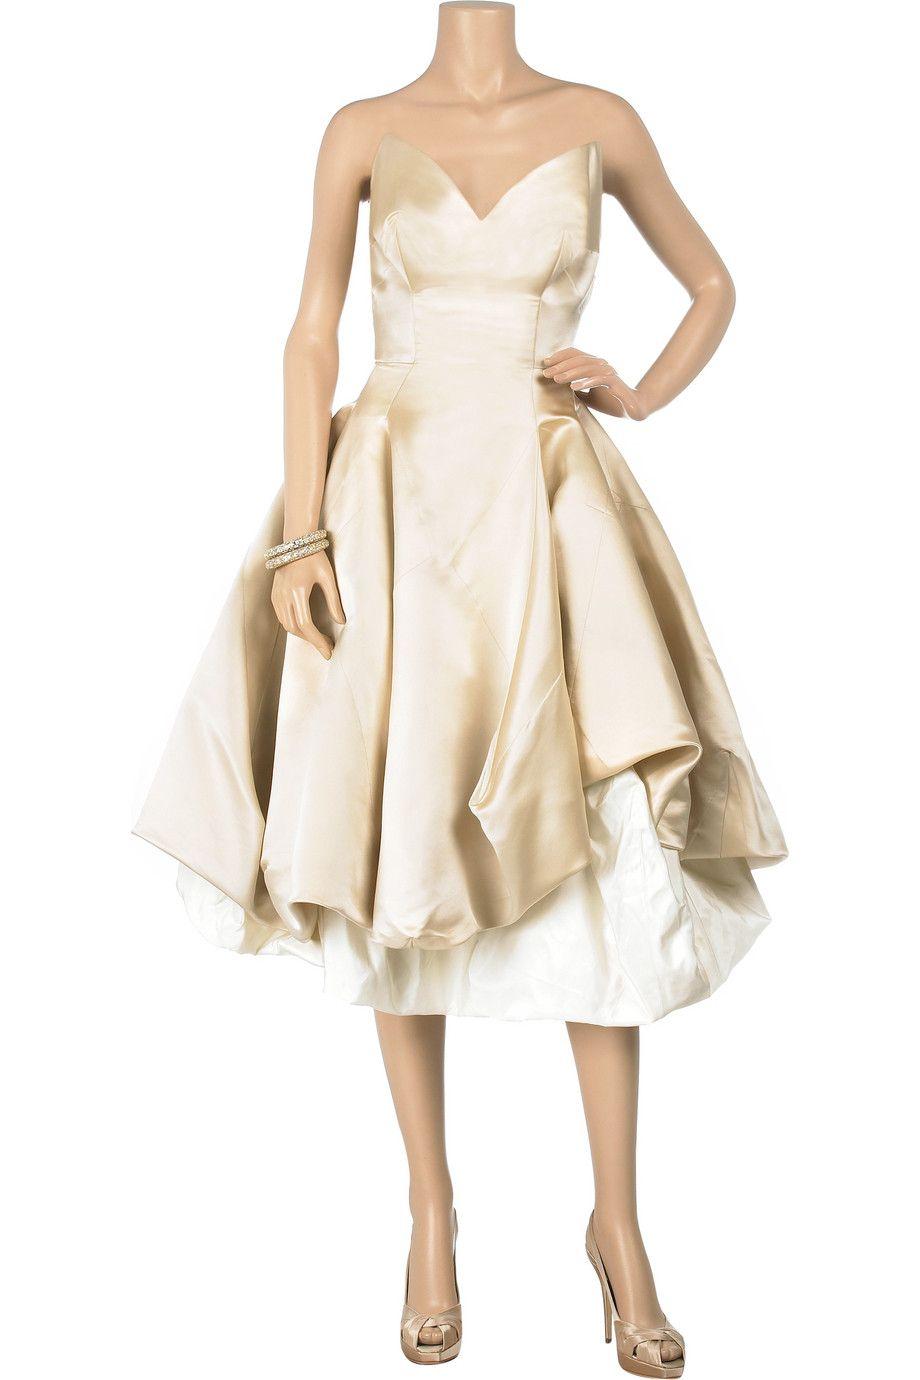 2f0dba00d49 Vivienne Westwood Gold Label Lily wedding gown